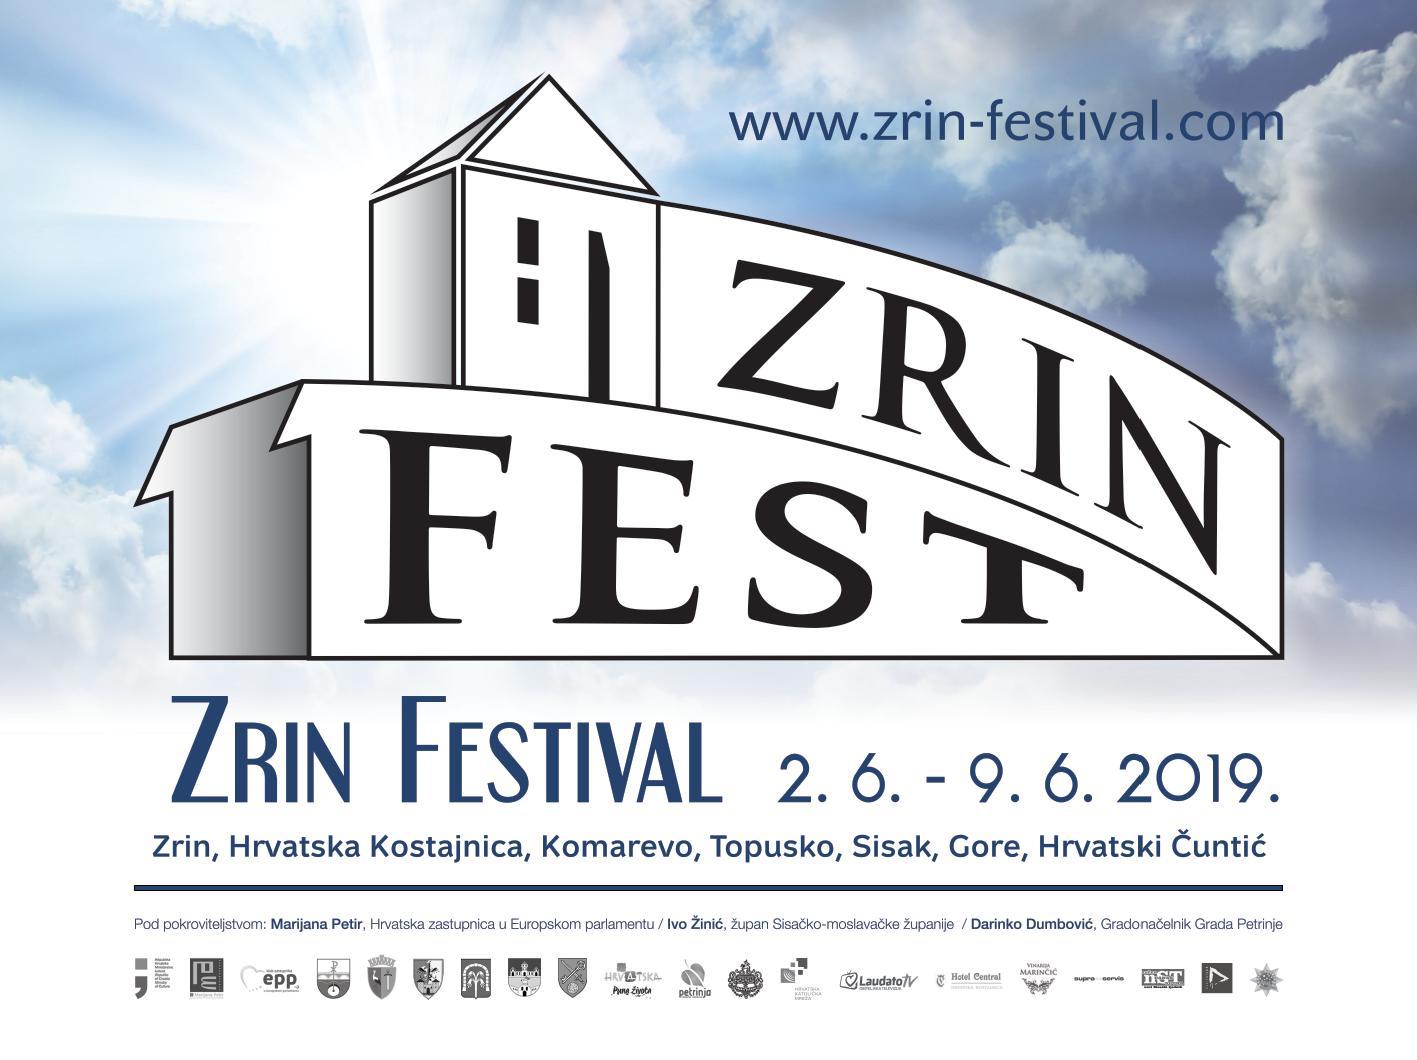 http://hrvatskifokus-2021.ga/wp-content/uploads/2019/05/zrin-festival-plakat.jpg